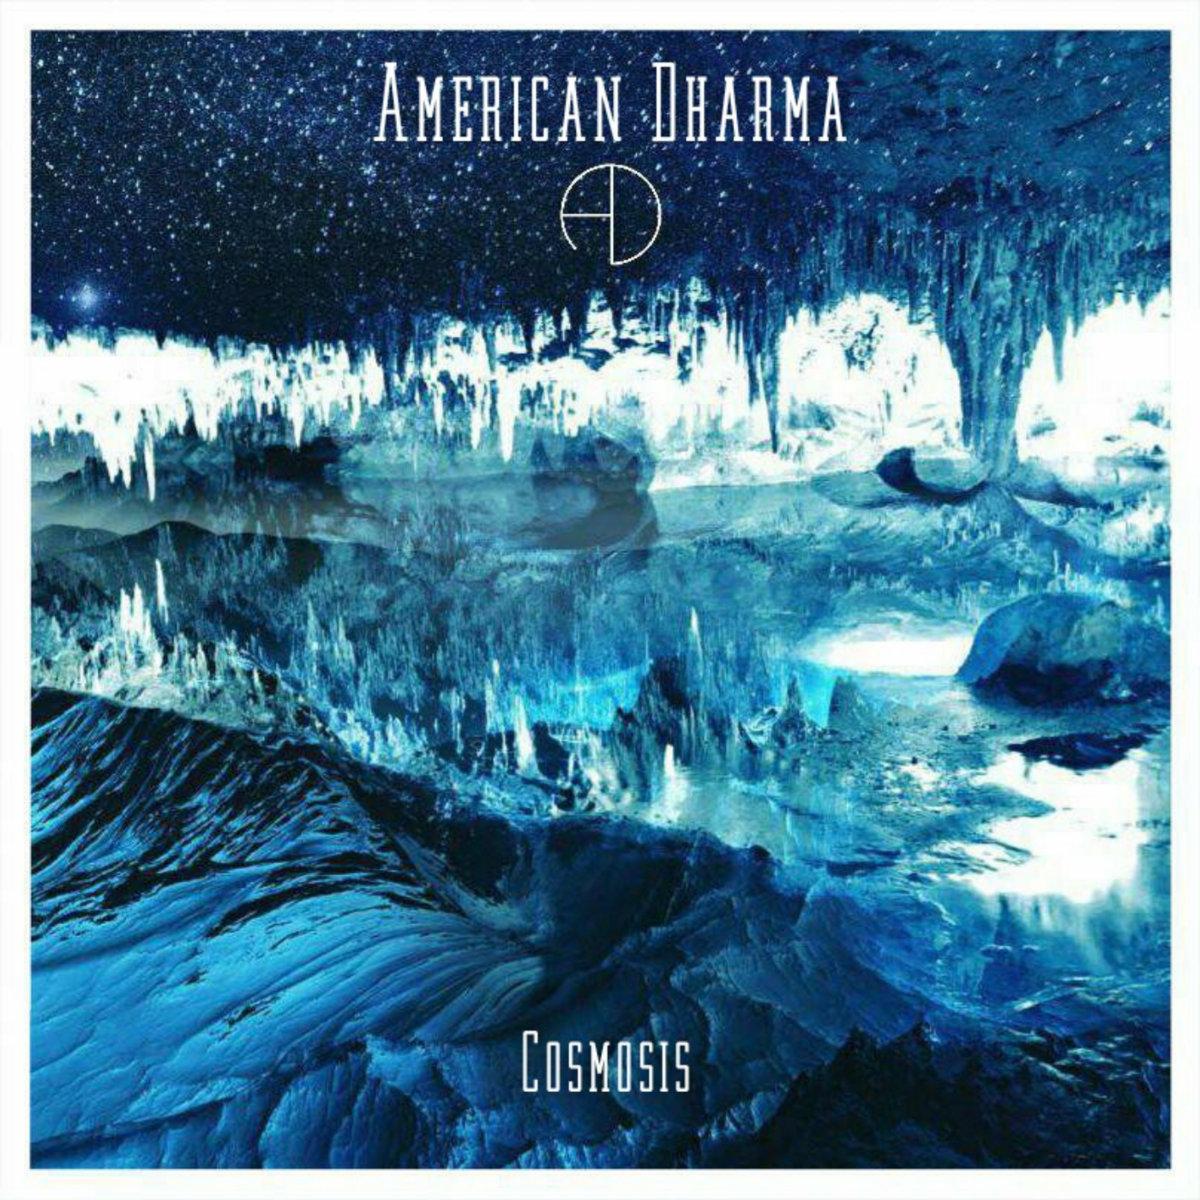 American Dharma COSMOSIS